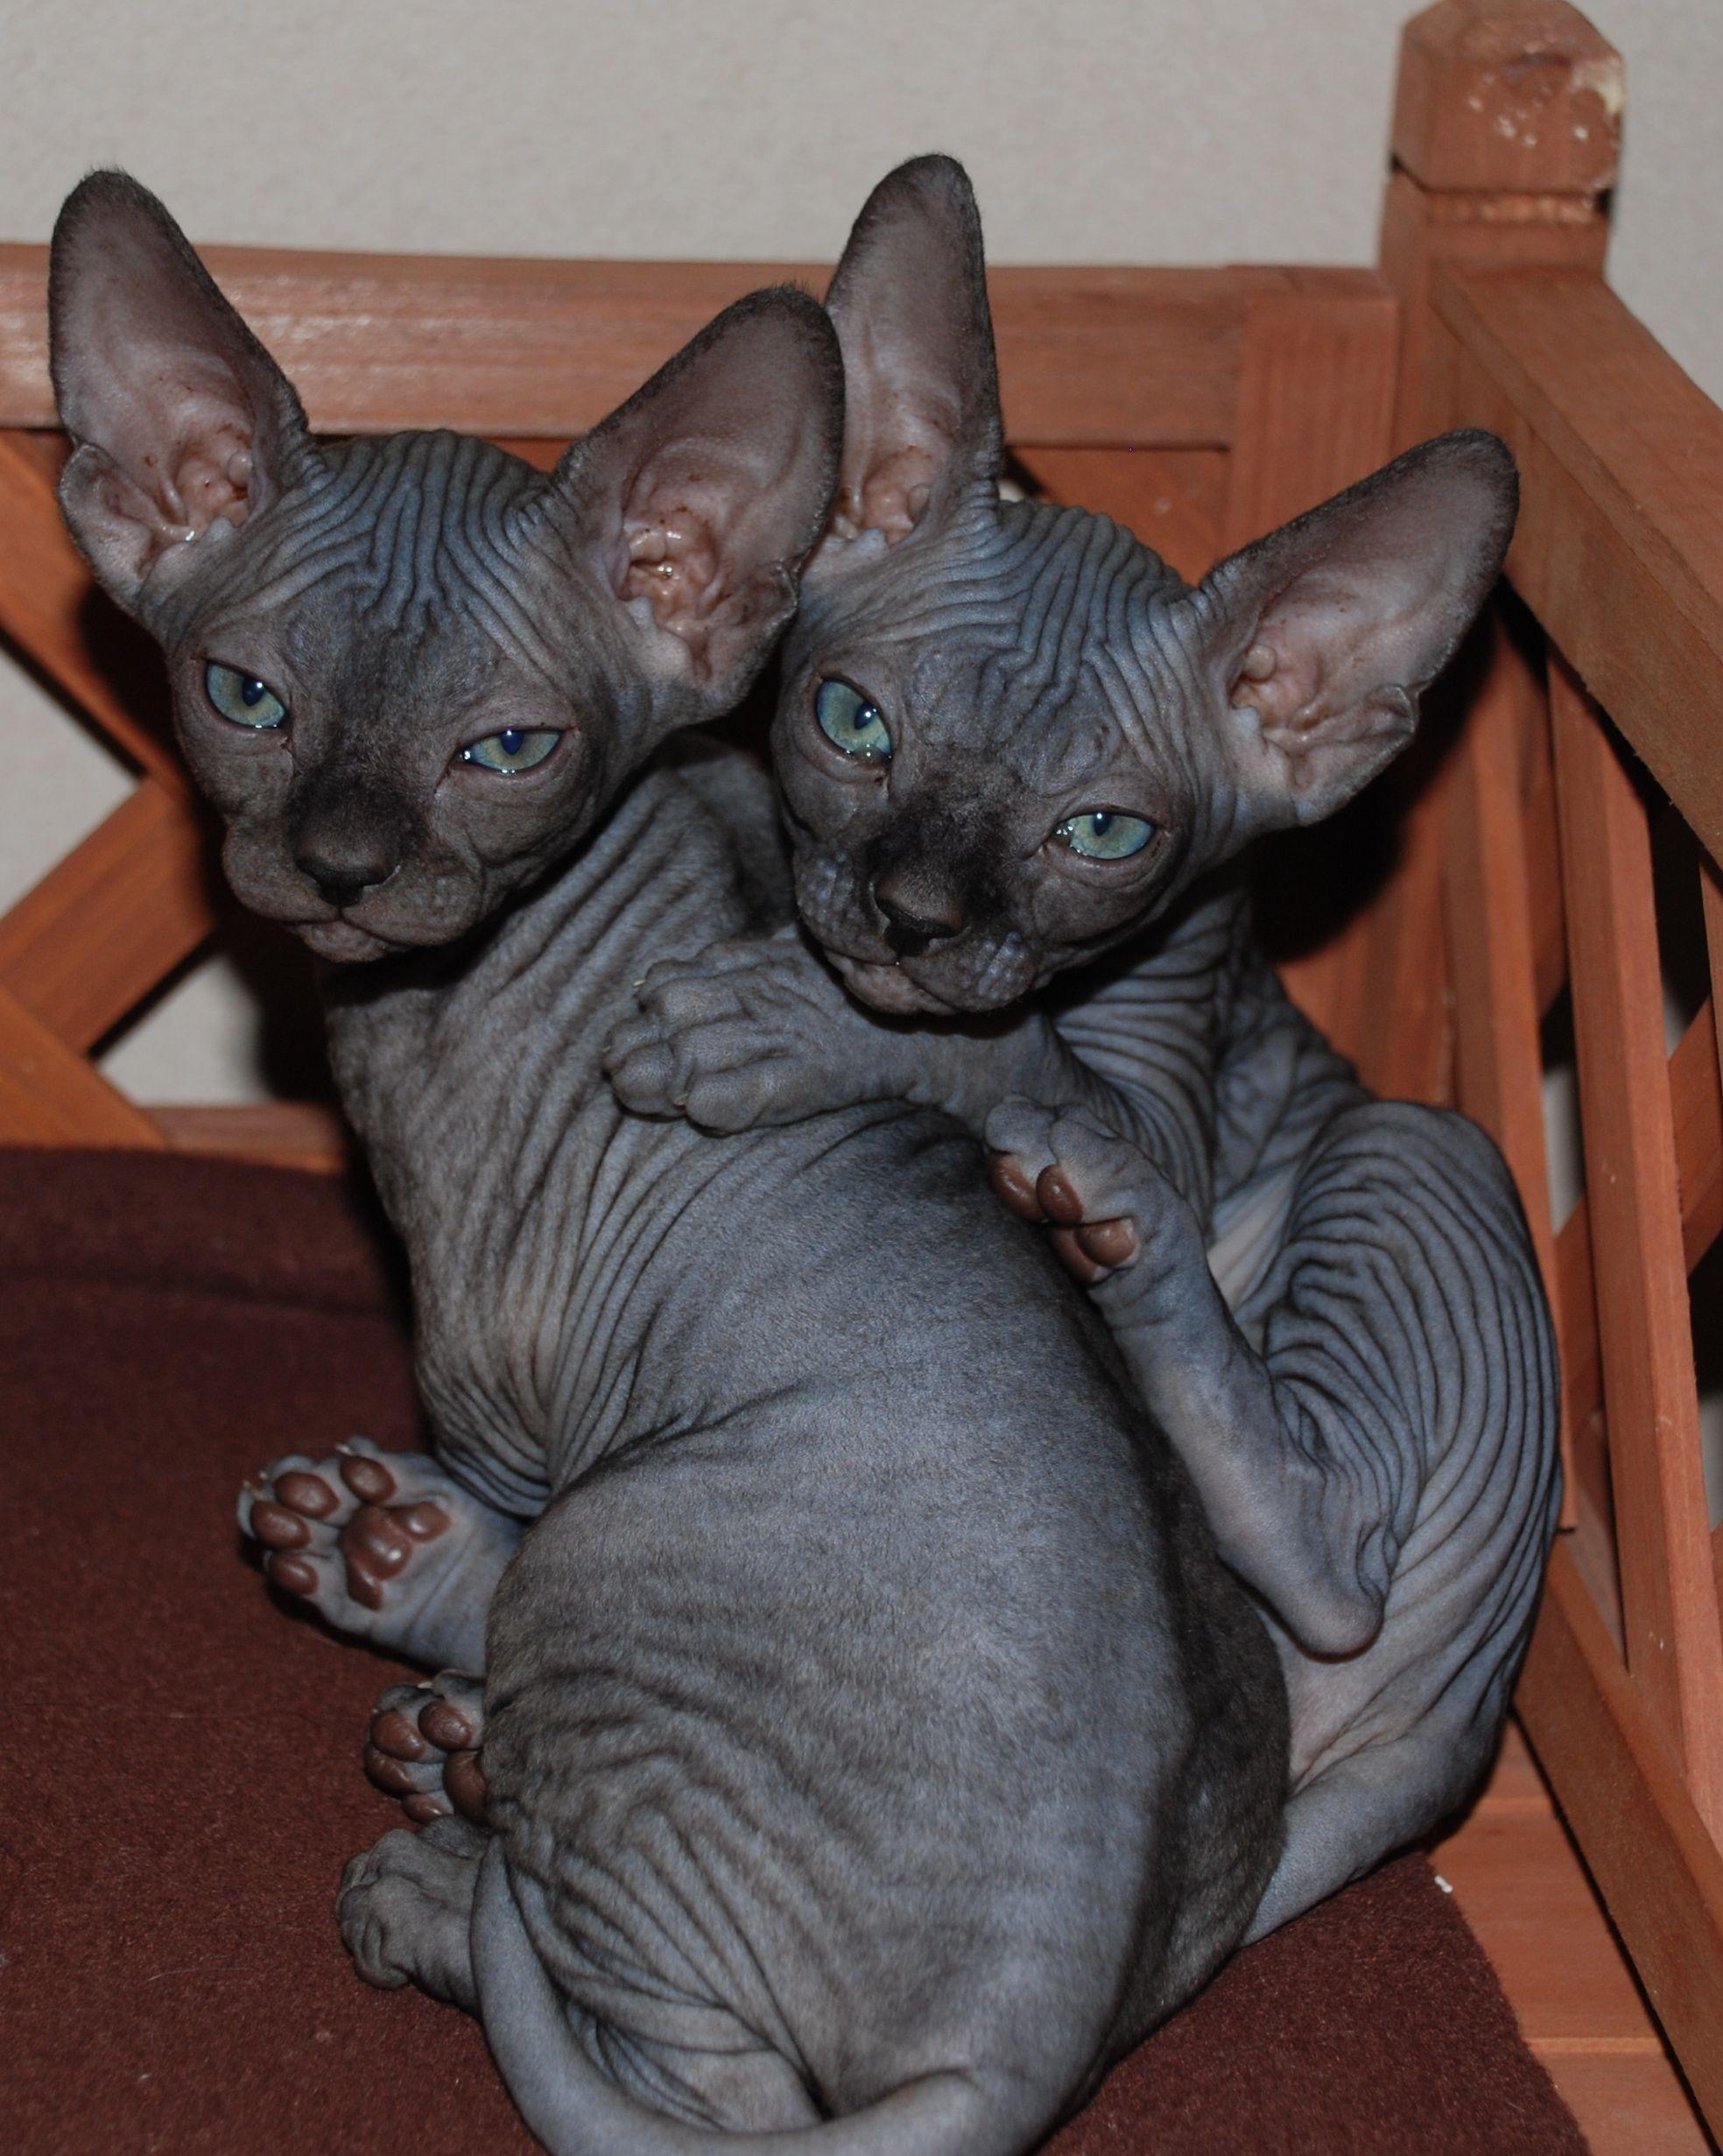 Hairless Kittens For Sale Near Me : hairless, kittens, Sphynx, Hairless, Kittens, Kitten, Sale,, Sphynx,